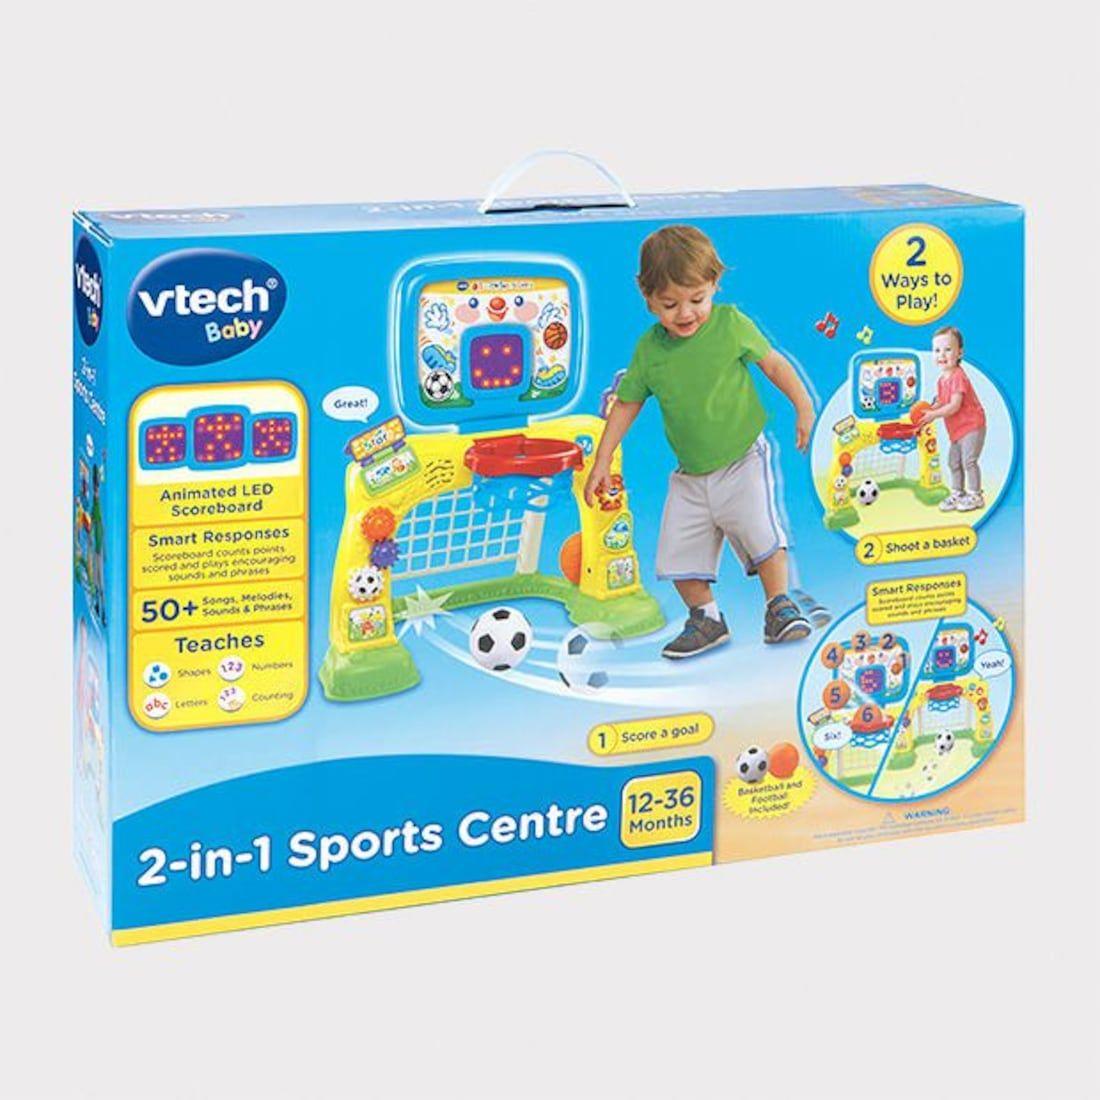 Vtech Baby 2In1 Sports Centre Vtech baby, Sports, Baby